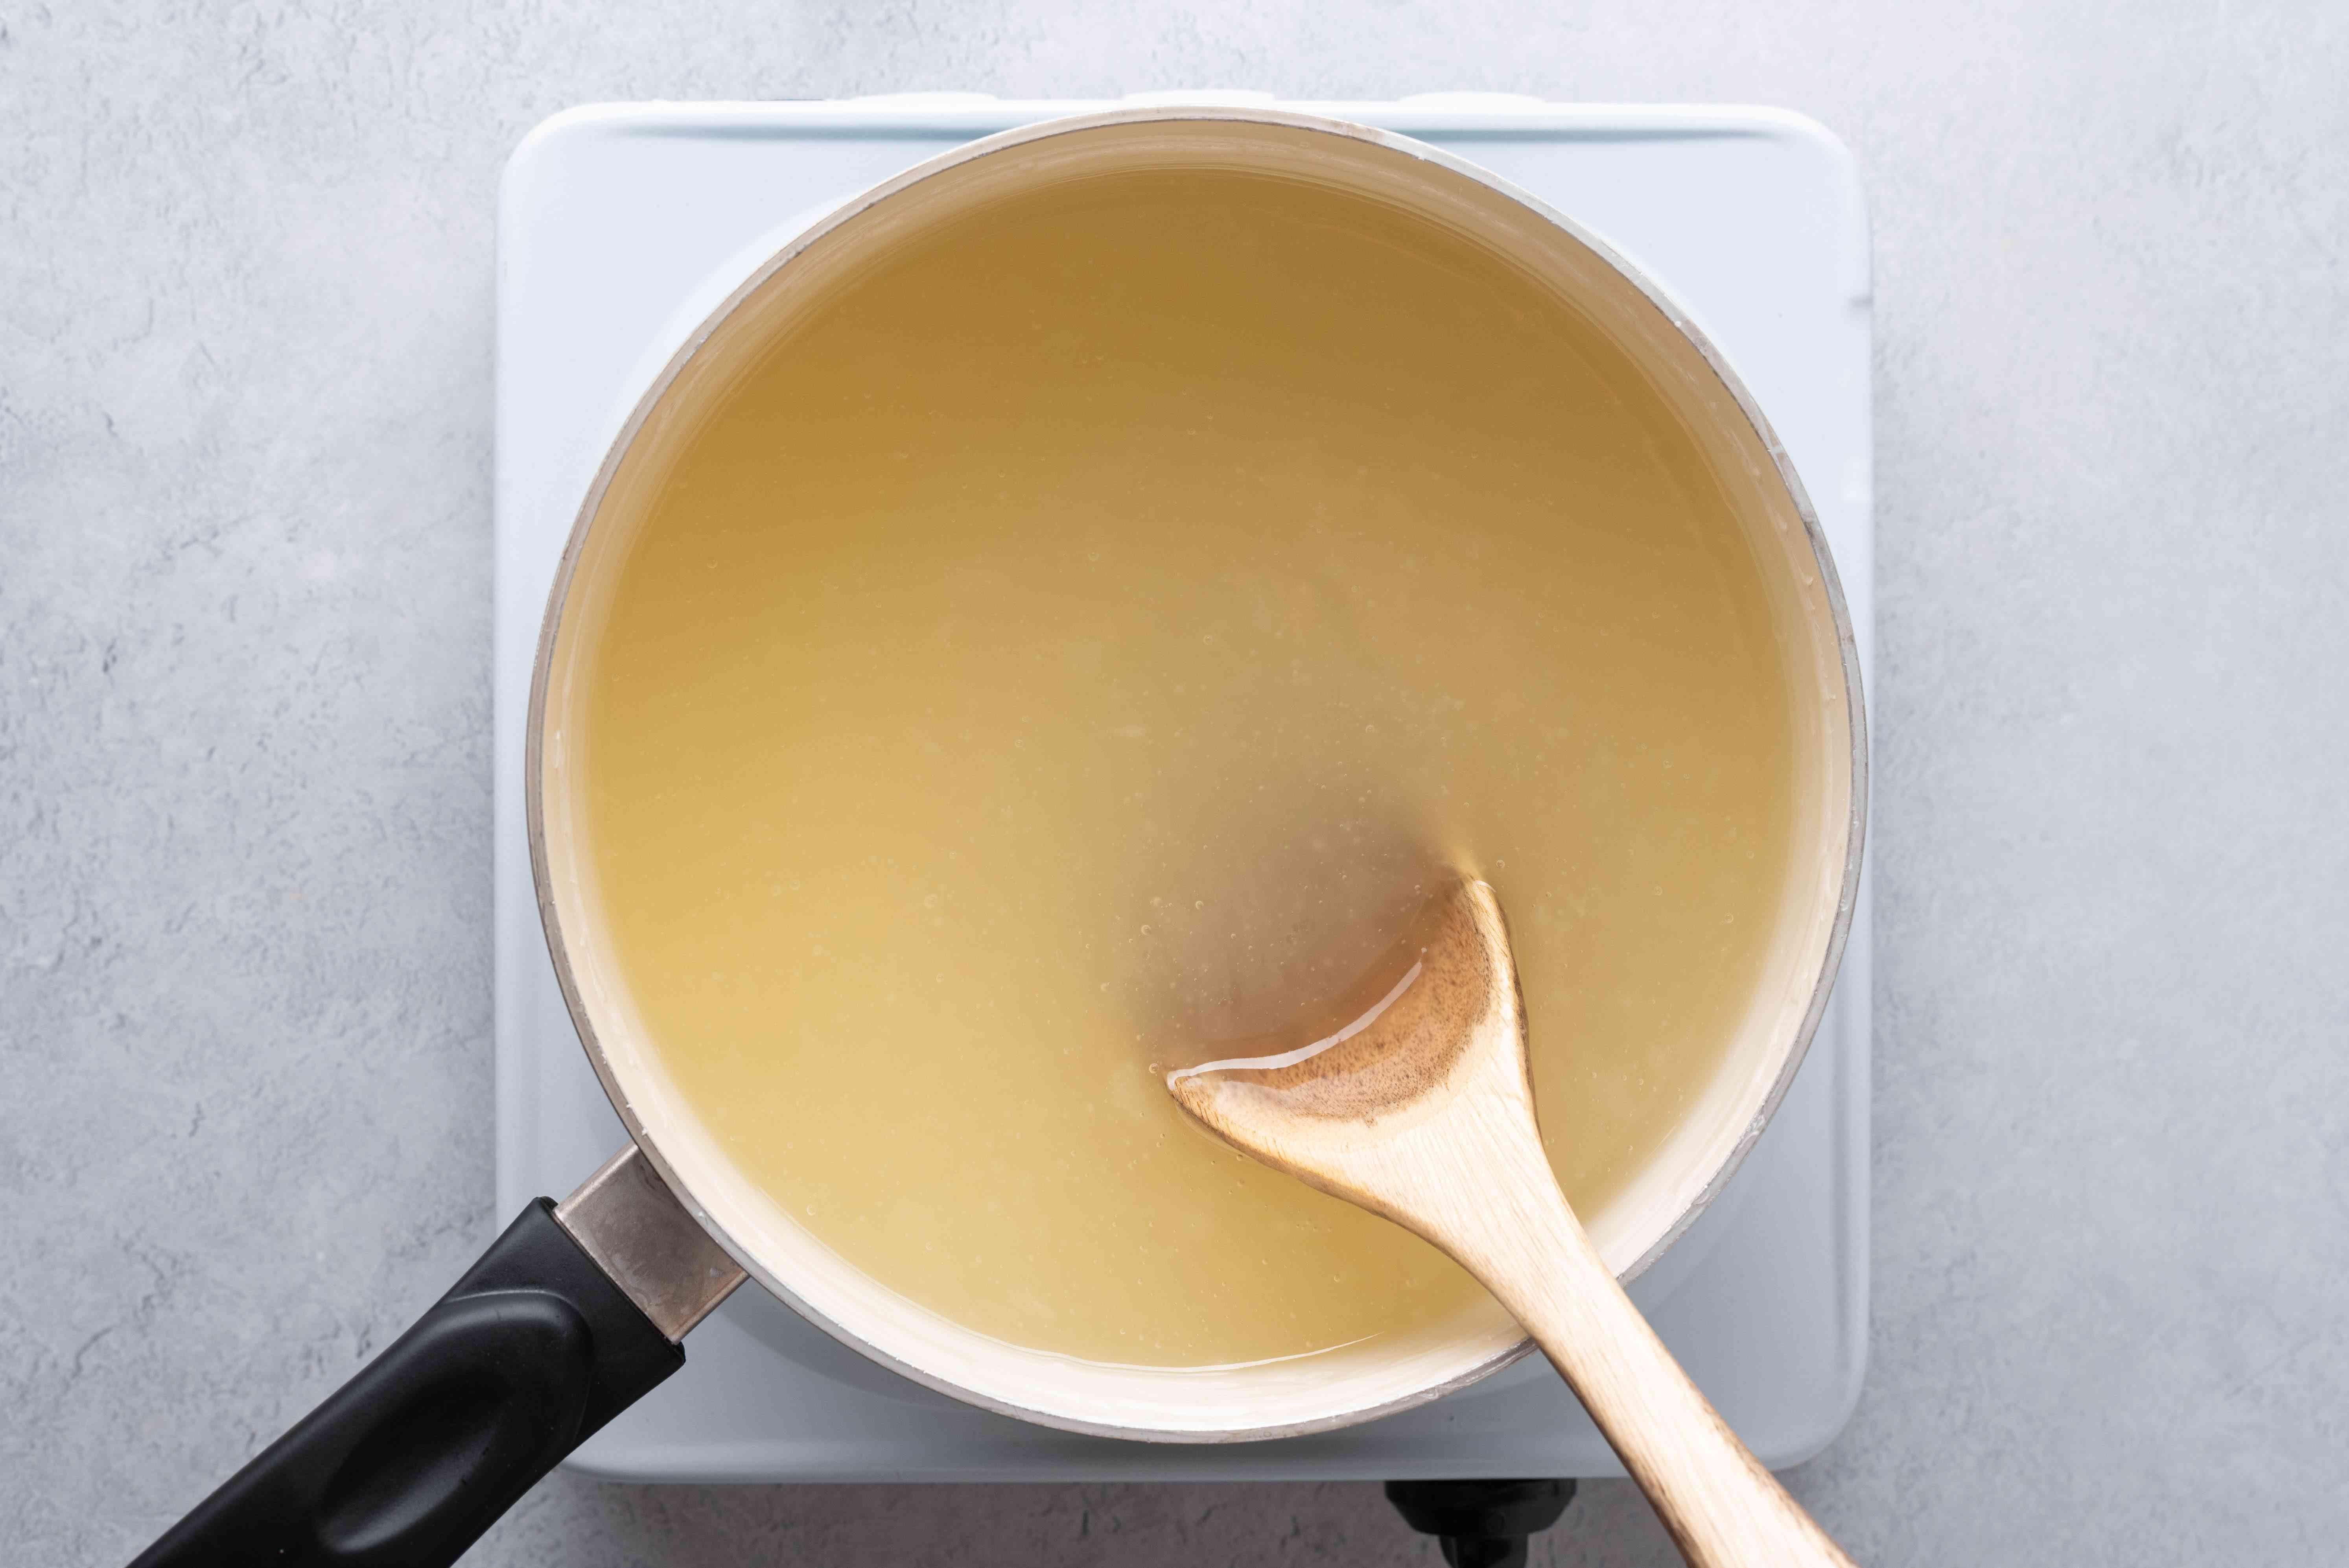 combine water, the granulated sugar, and lemon juice in a saucepan